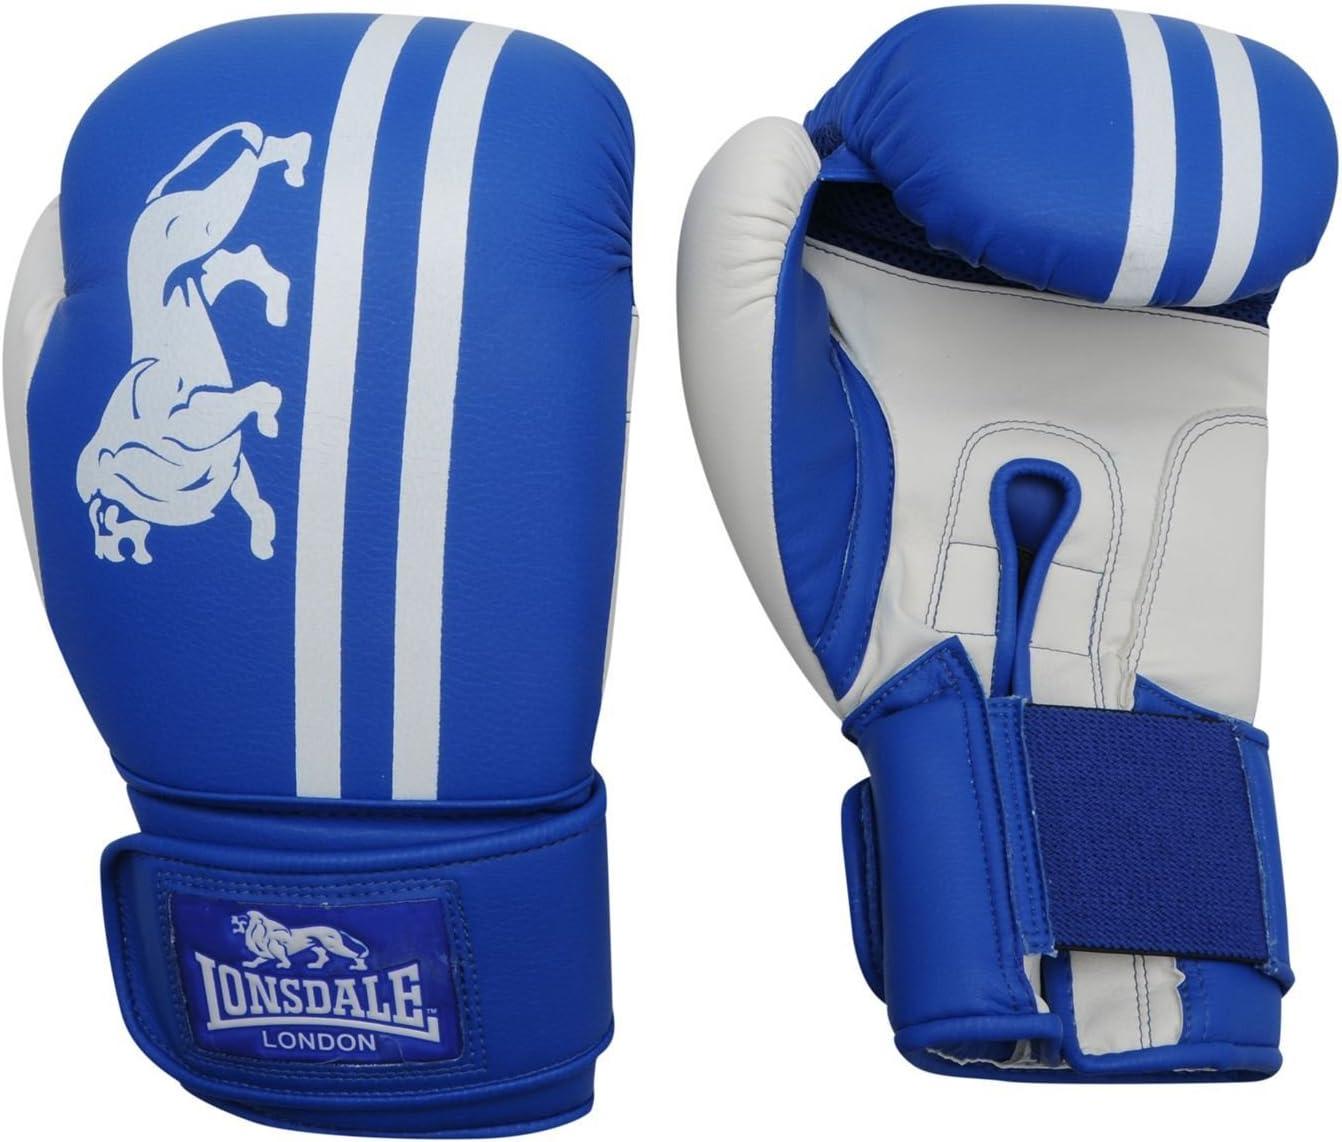 Lonsdale London Club スパーリングボクシンググローブ ジムフィットネスバッグ スパーリンググローブ ブルー/ホワイト 14 oz